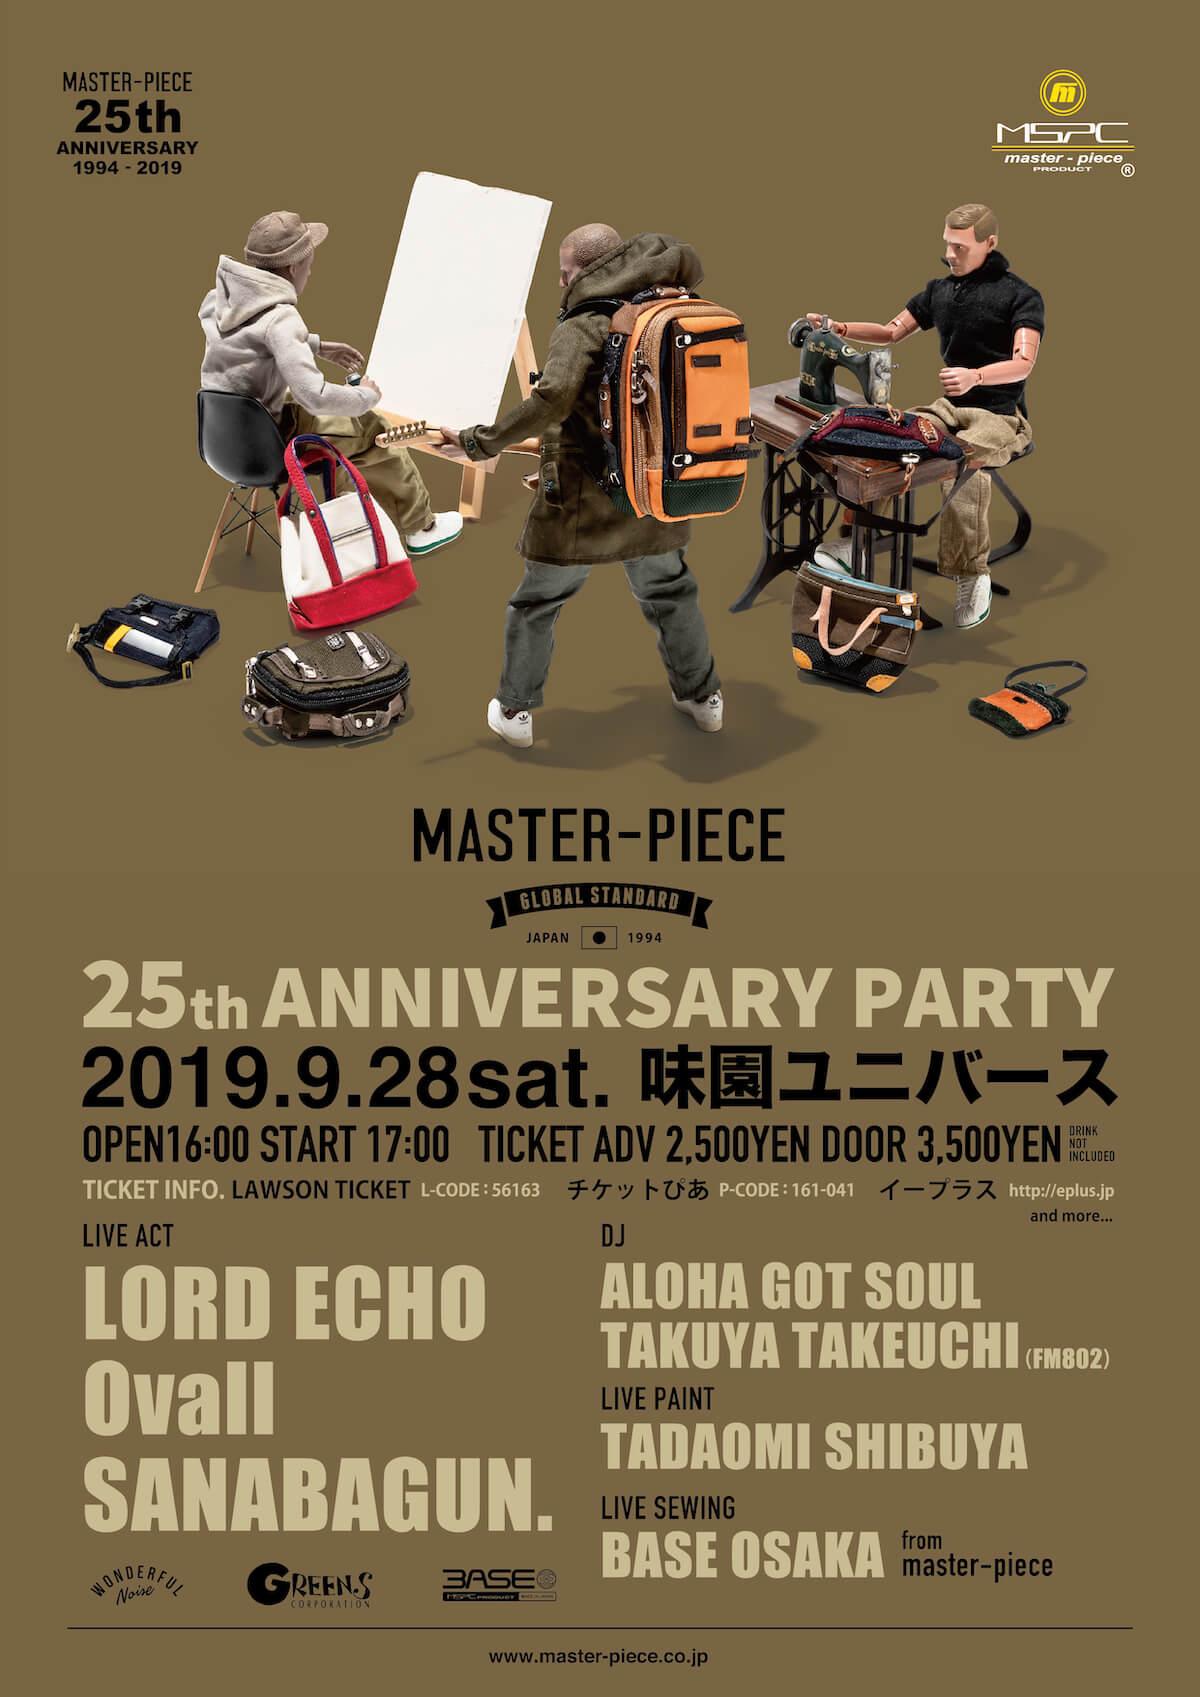 LORD ECHO、Ovall、SANABAGUN.ら出演!ブランド誕生25周年「master-piece」がカルチャーMIXイベントを開催 mu190806_master-piece3